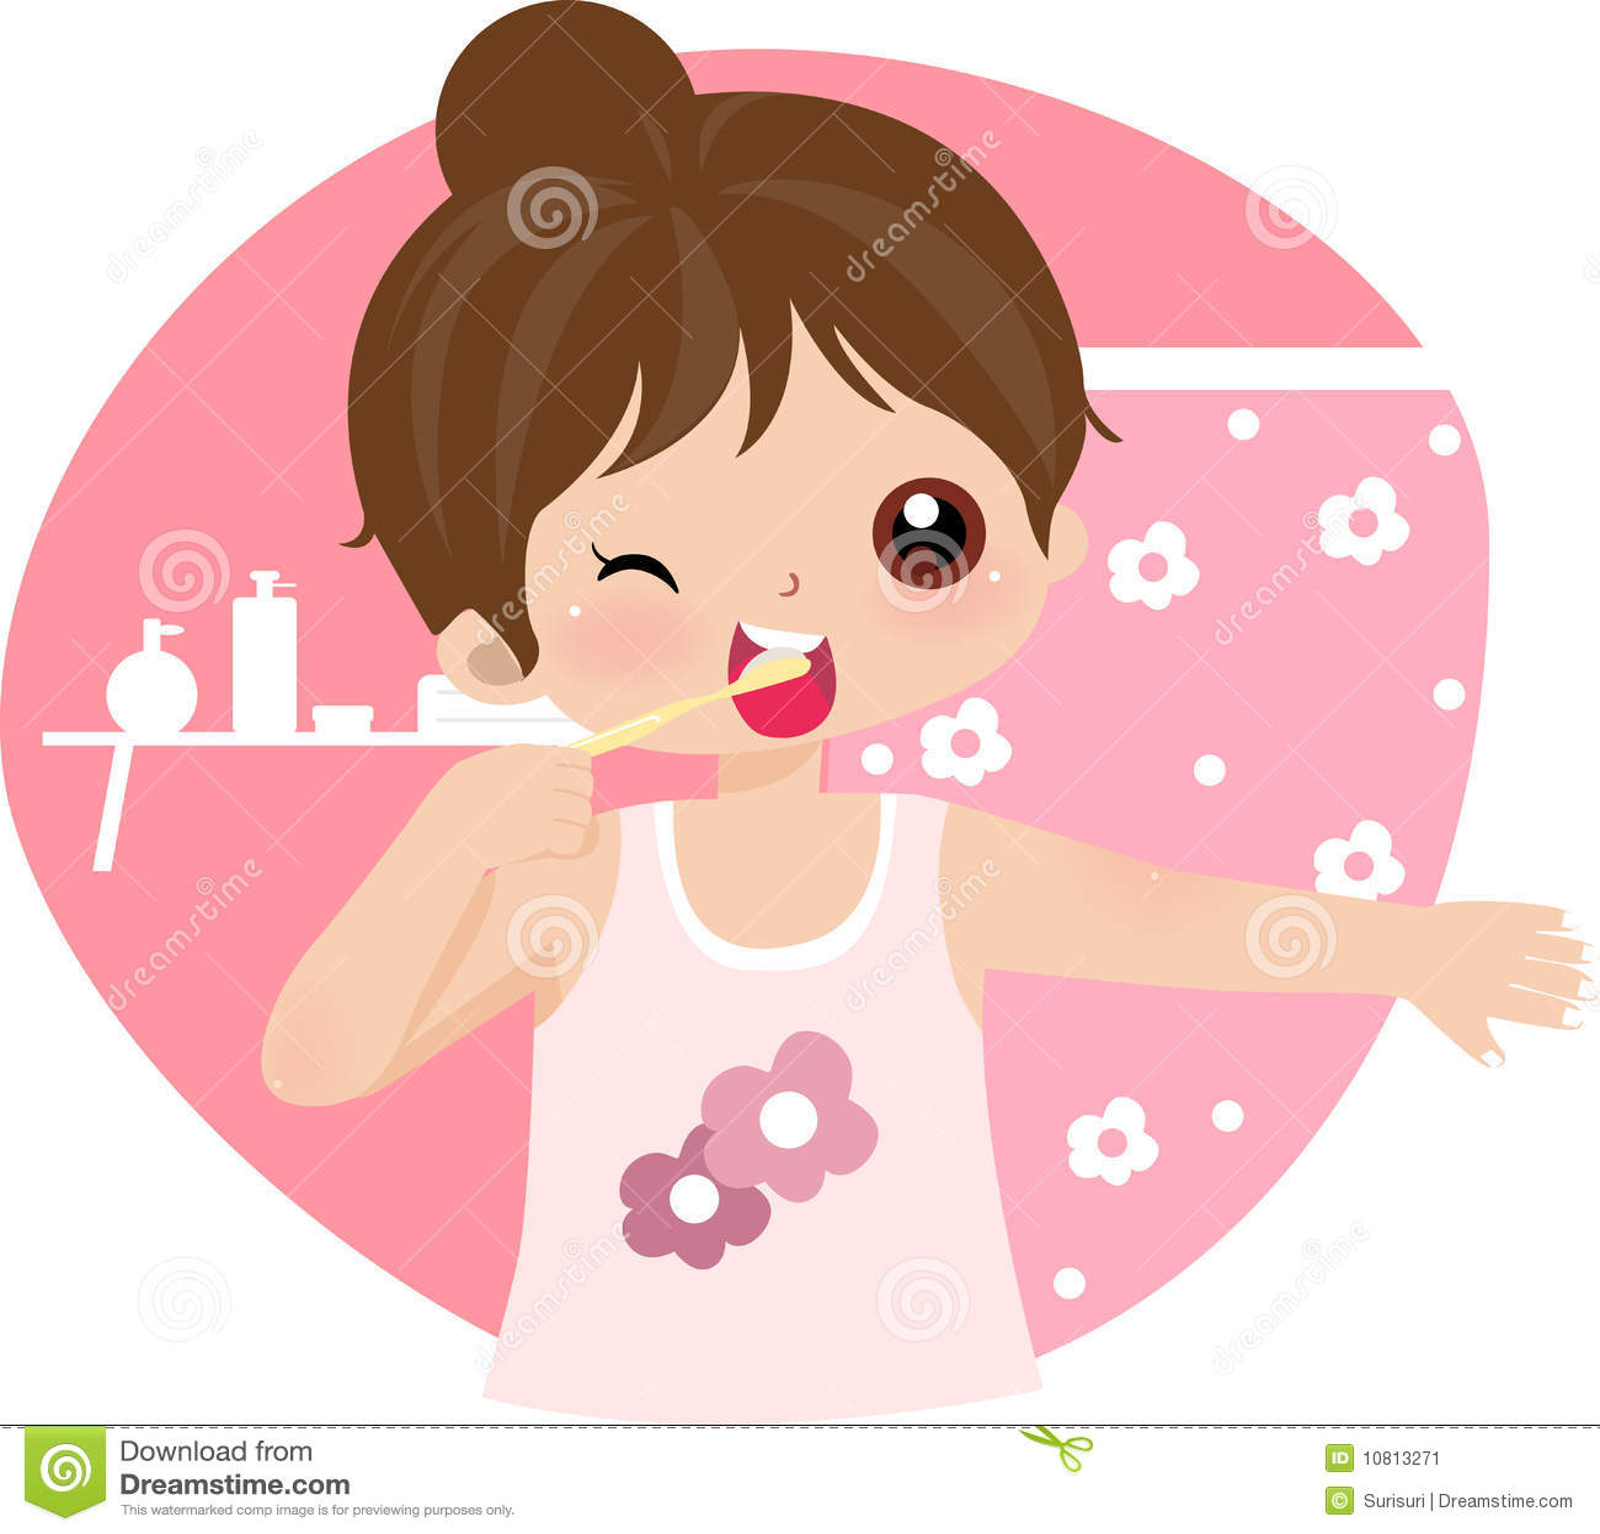 brush teeth stock vector illustration of child foam 10813271